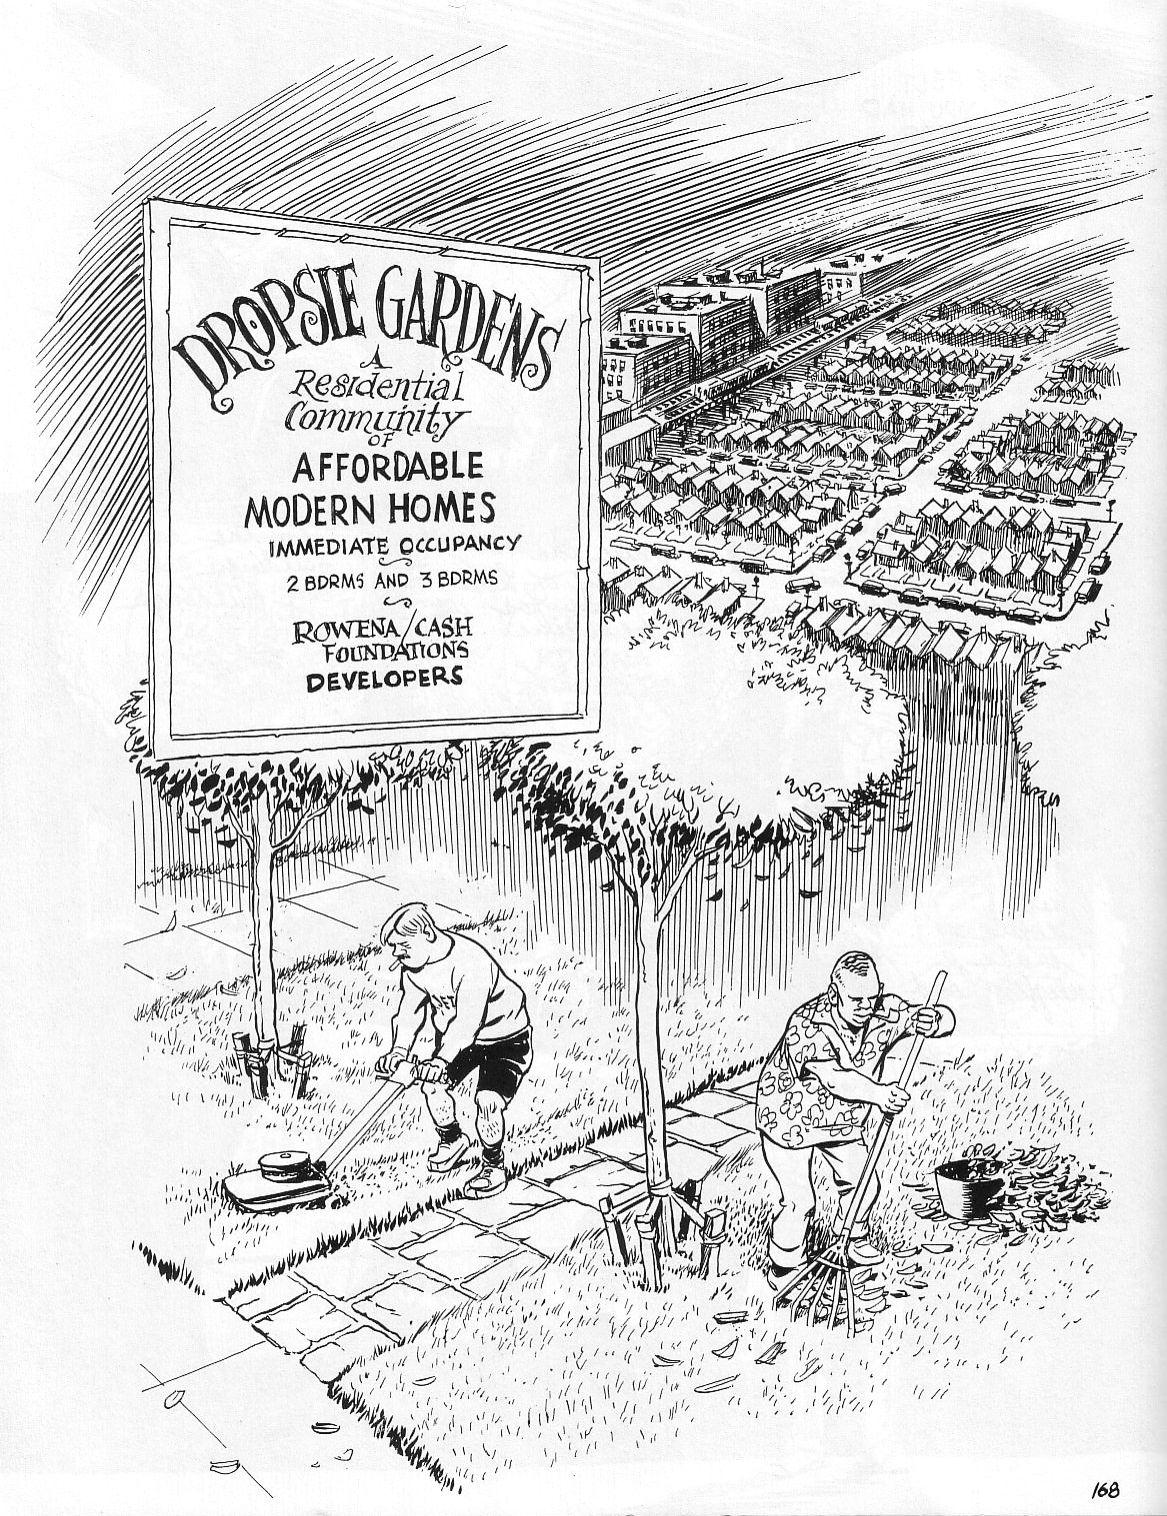 Read online Dropsie Avenue, The Neighborhood comic -  Issue # Full - 170